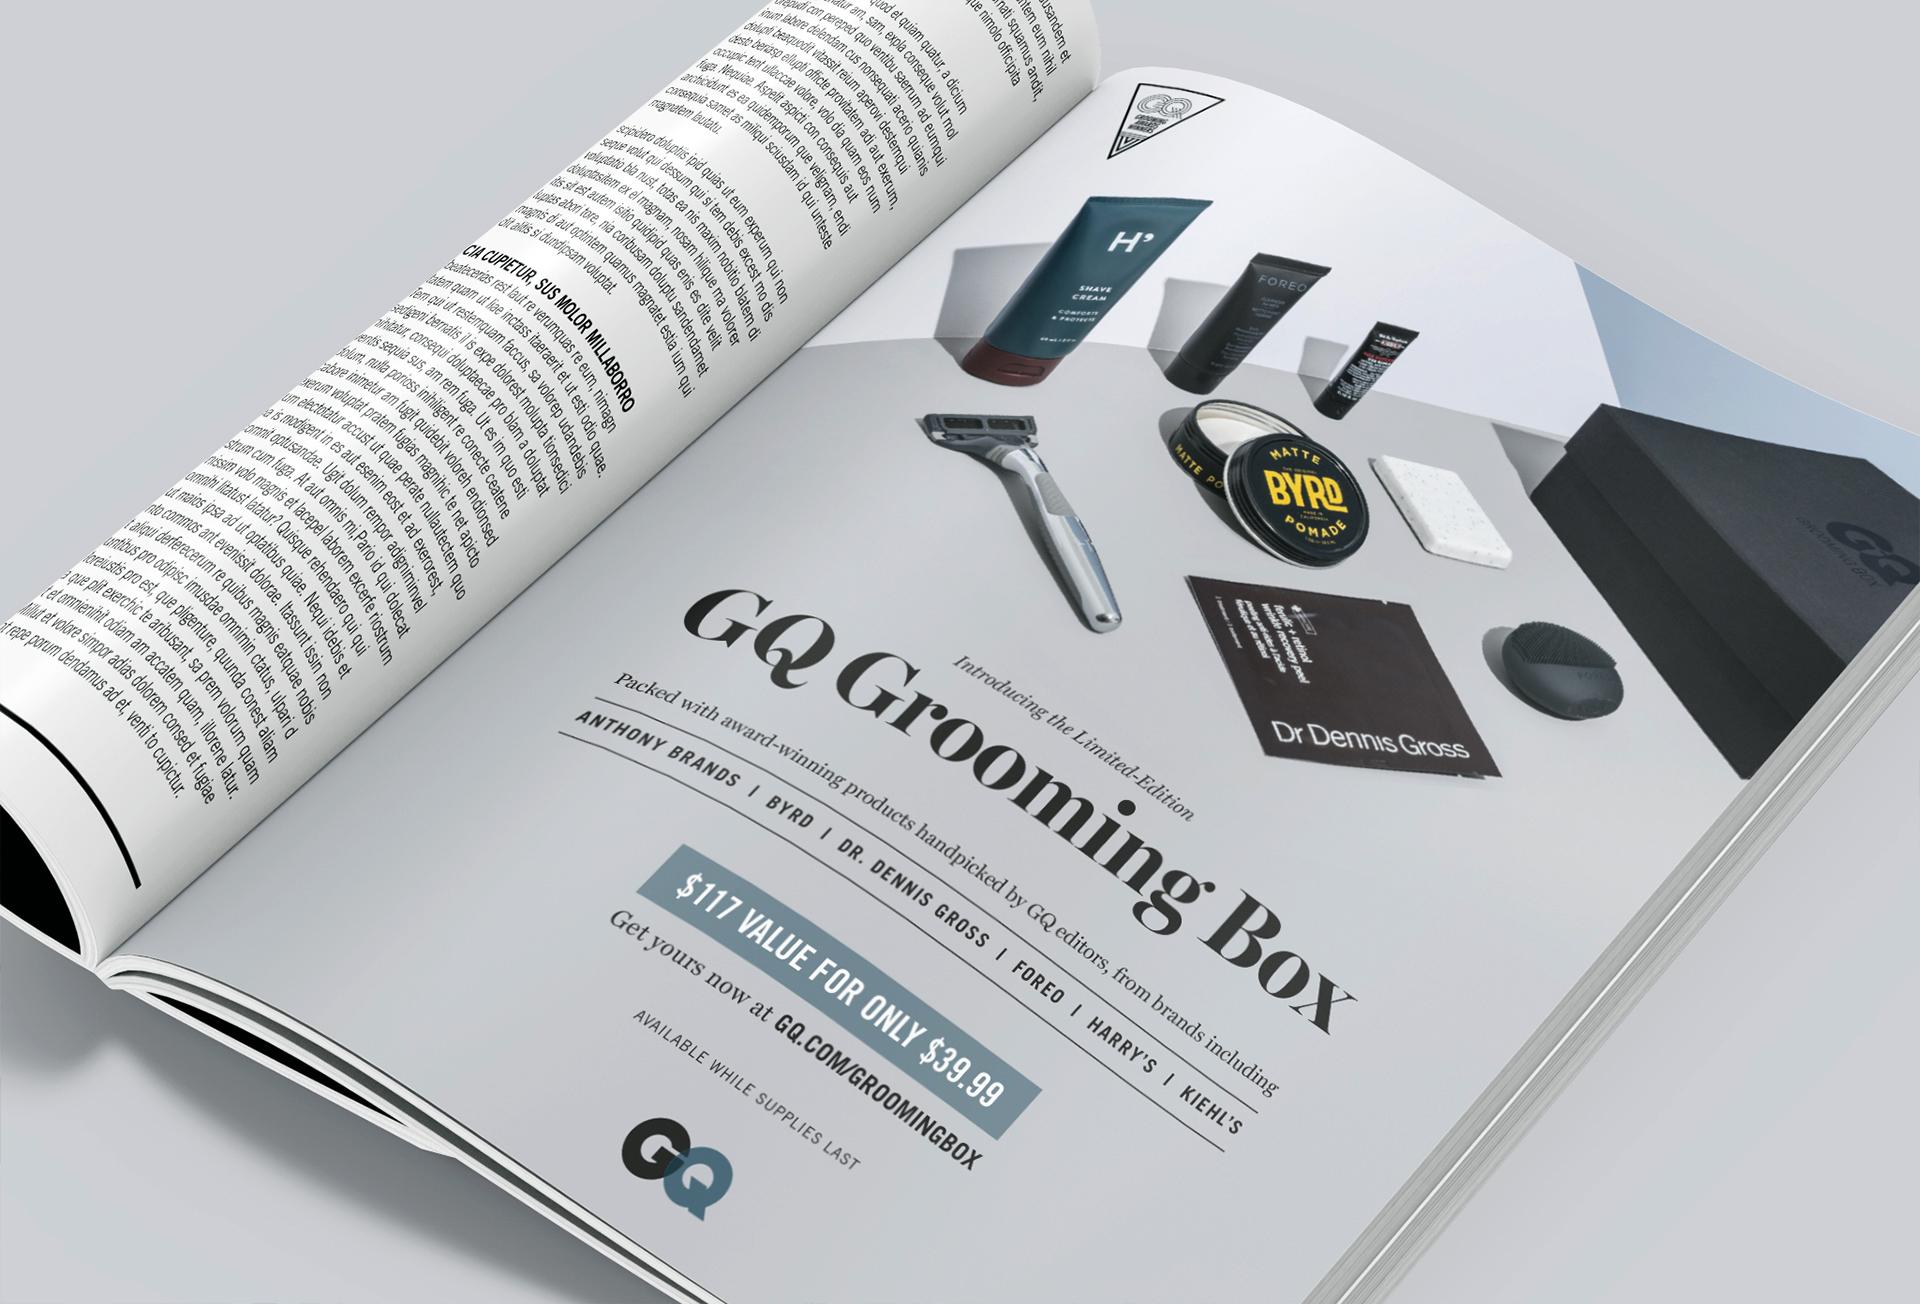 GQ Magazine 1